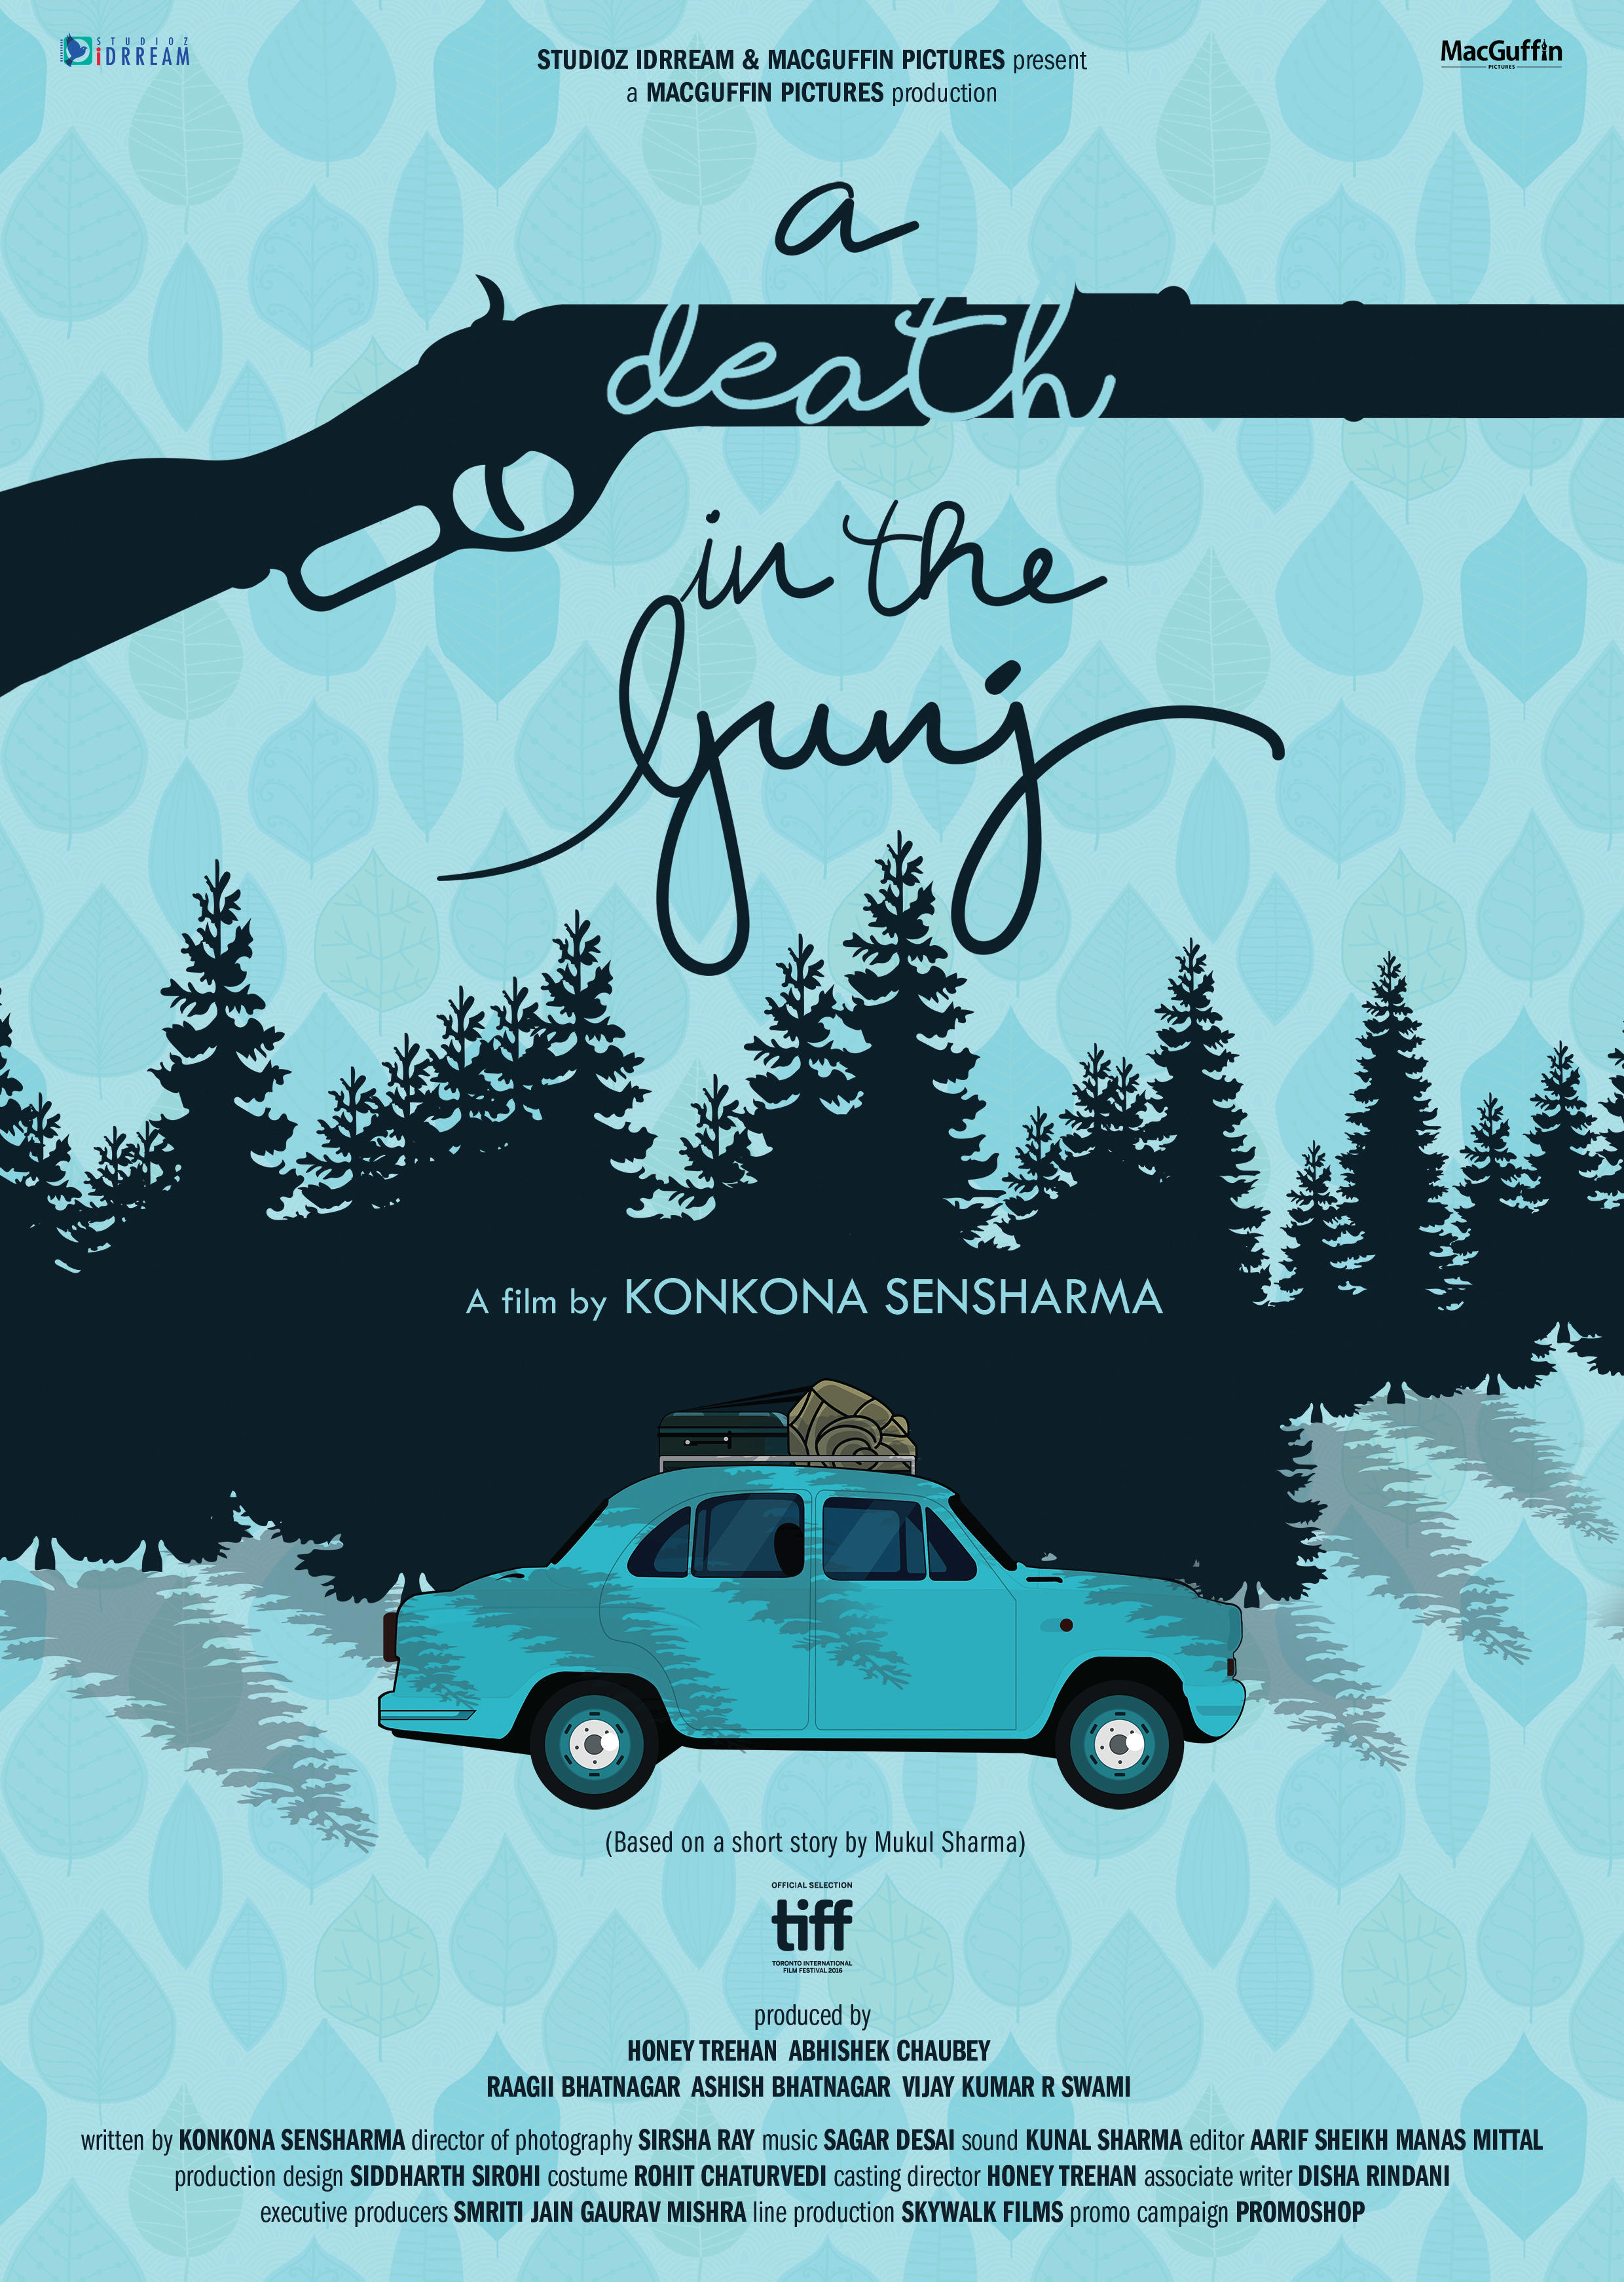 Movie Review: Konkona Sen Sharma's A Death In The Gunj